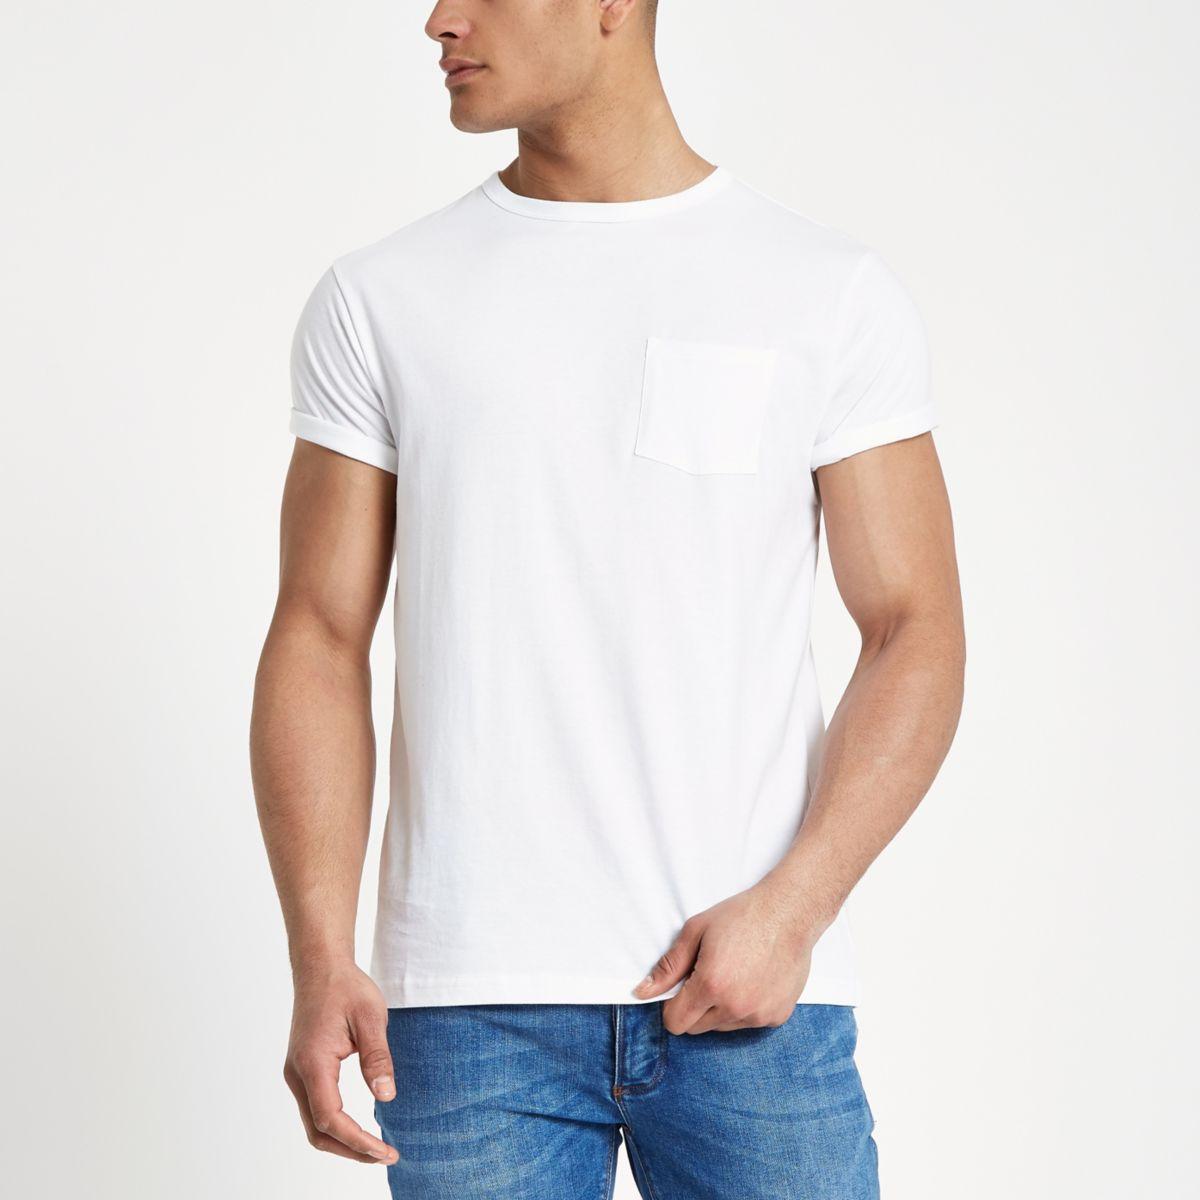 White crew neck chest pocket T-shirt